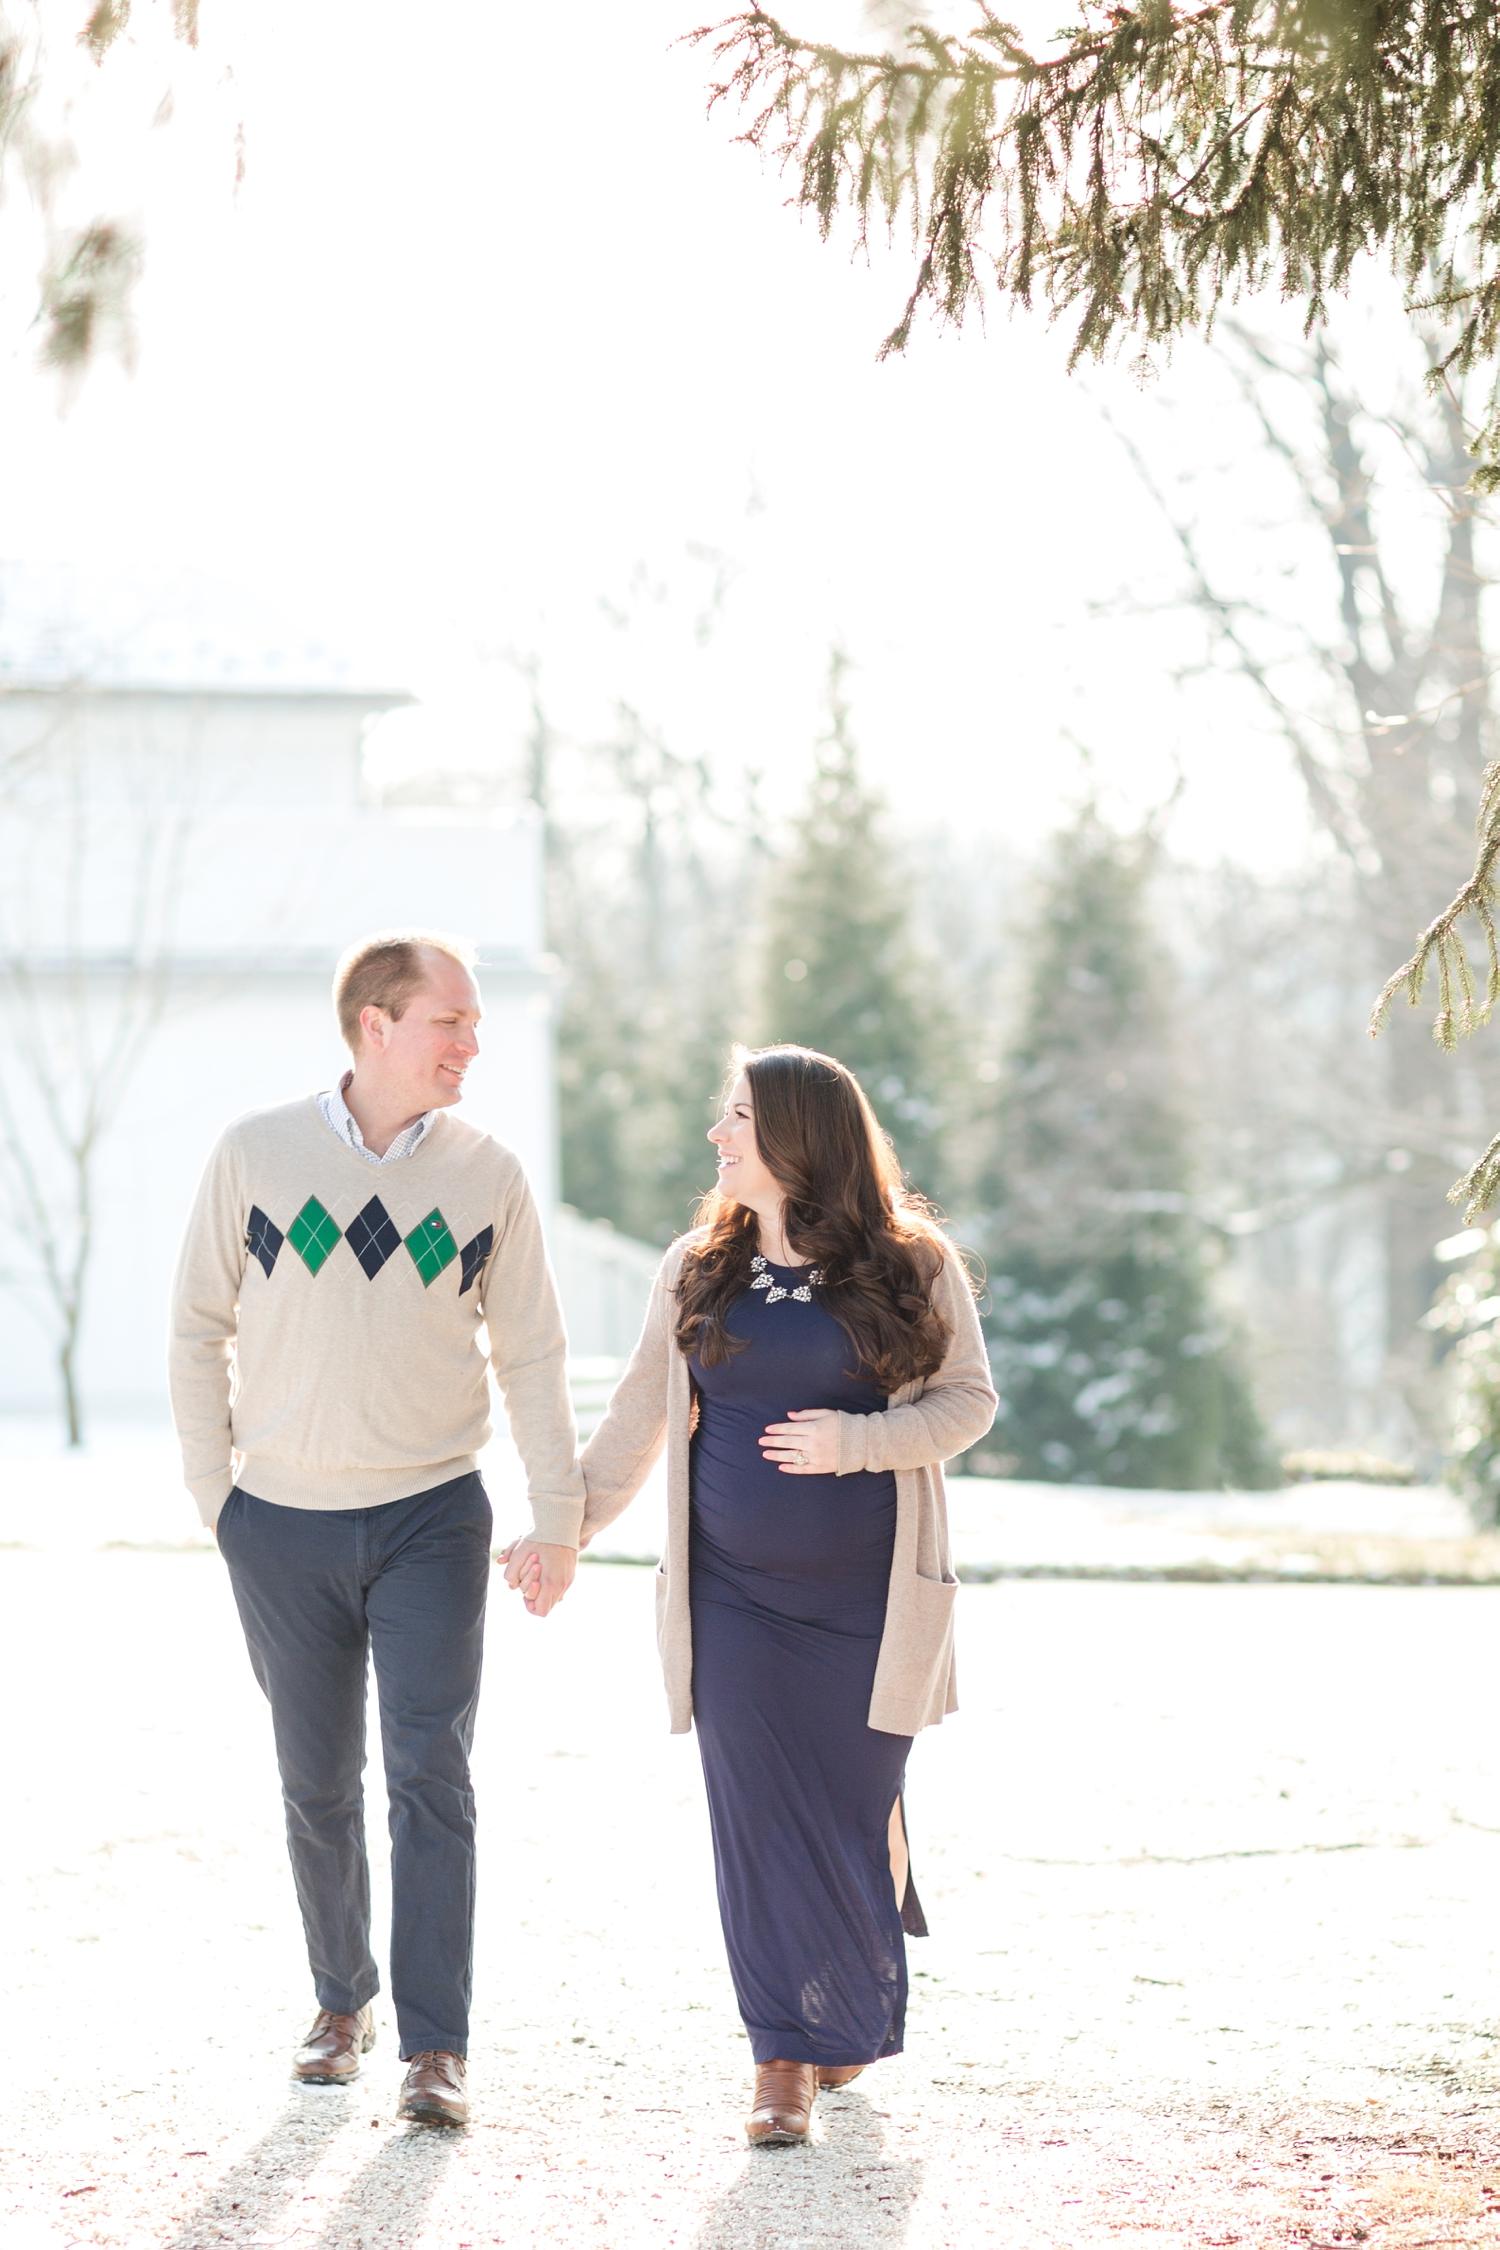 Garbow Maternity-22_Maryland-Maternity-Photographer-Hampton-Historic-Mansion-photographer-anna-grace-photography-photo.jpg